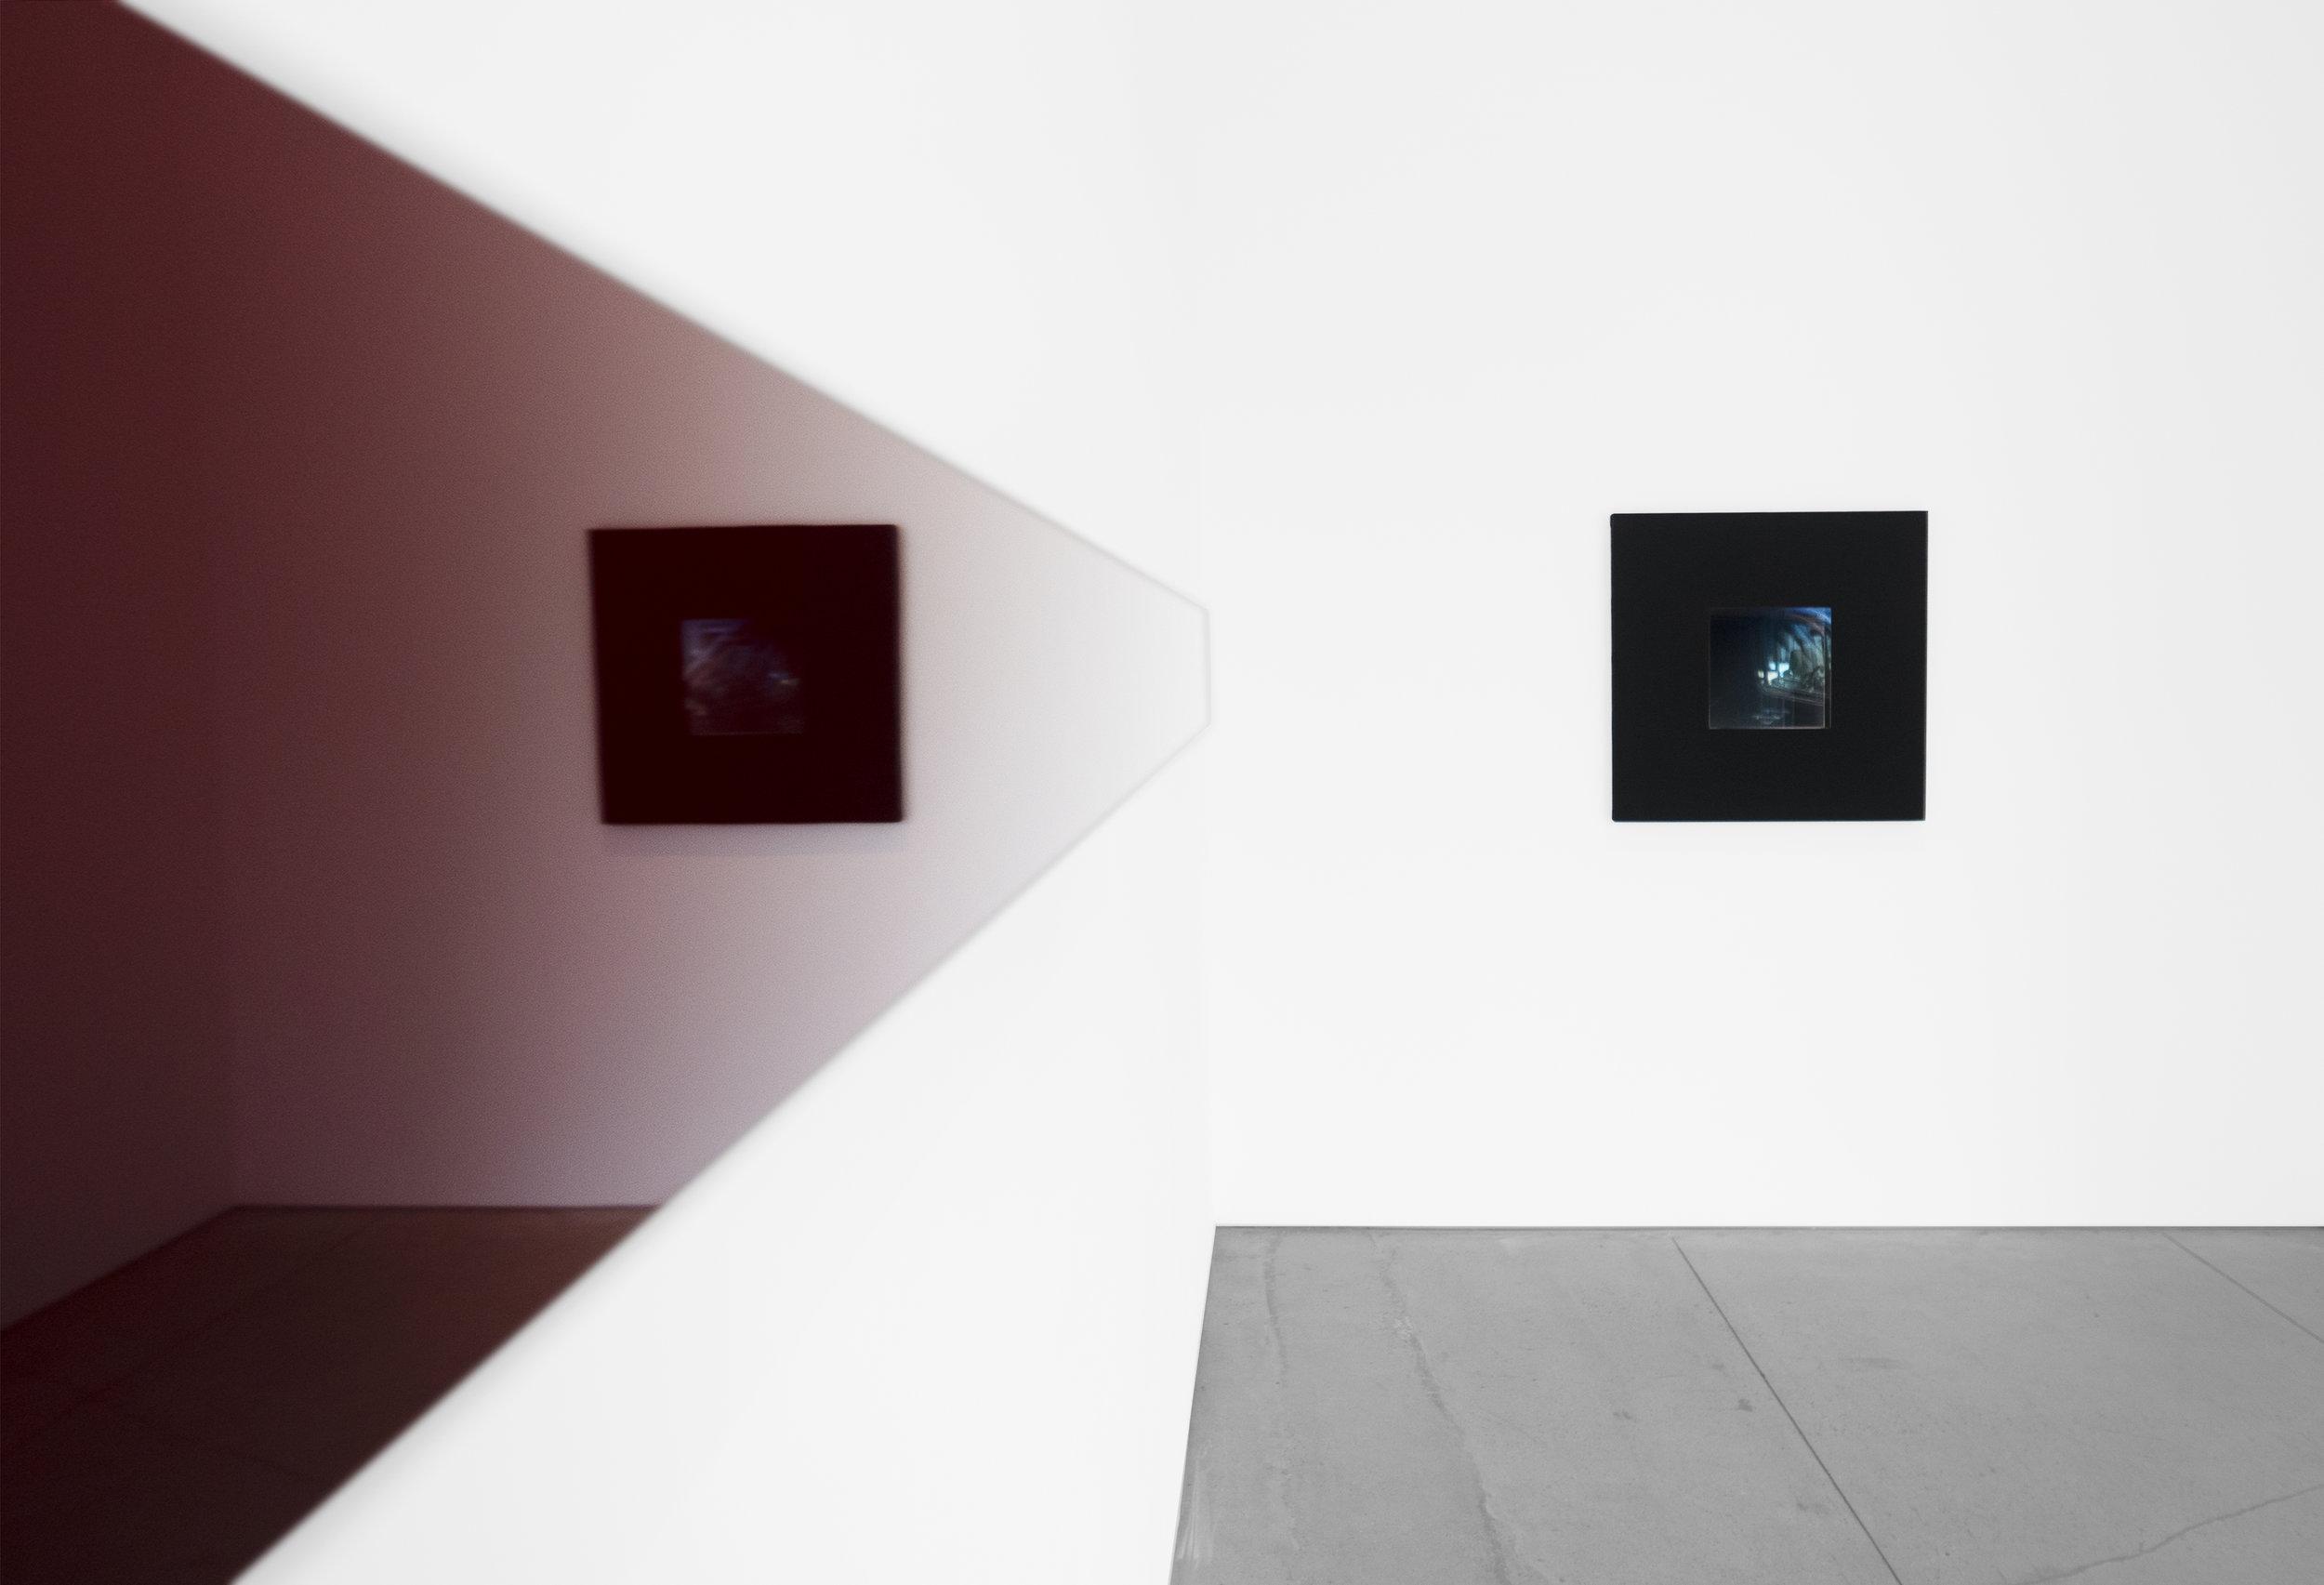 25 Years_Peter Blake Gallery_2019_Installation View_5.jpg